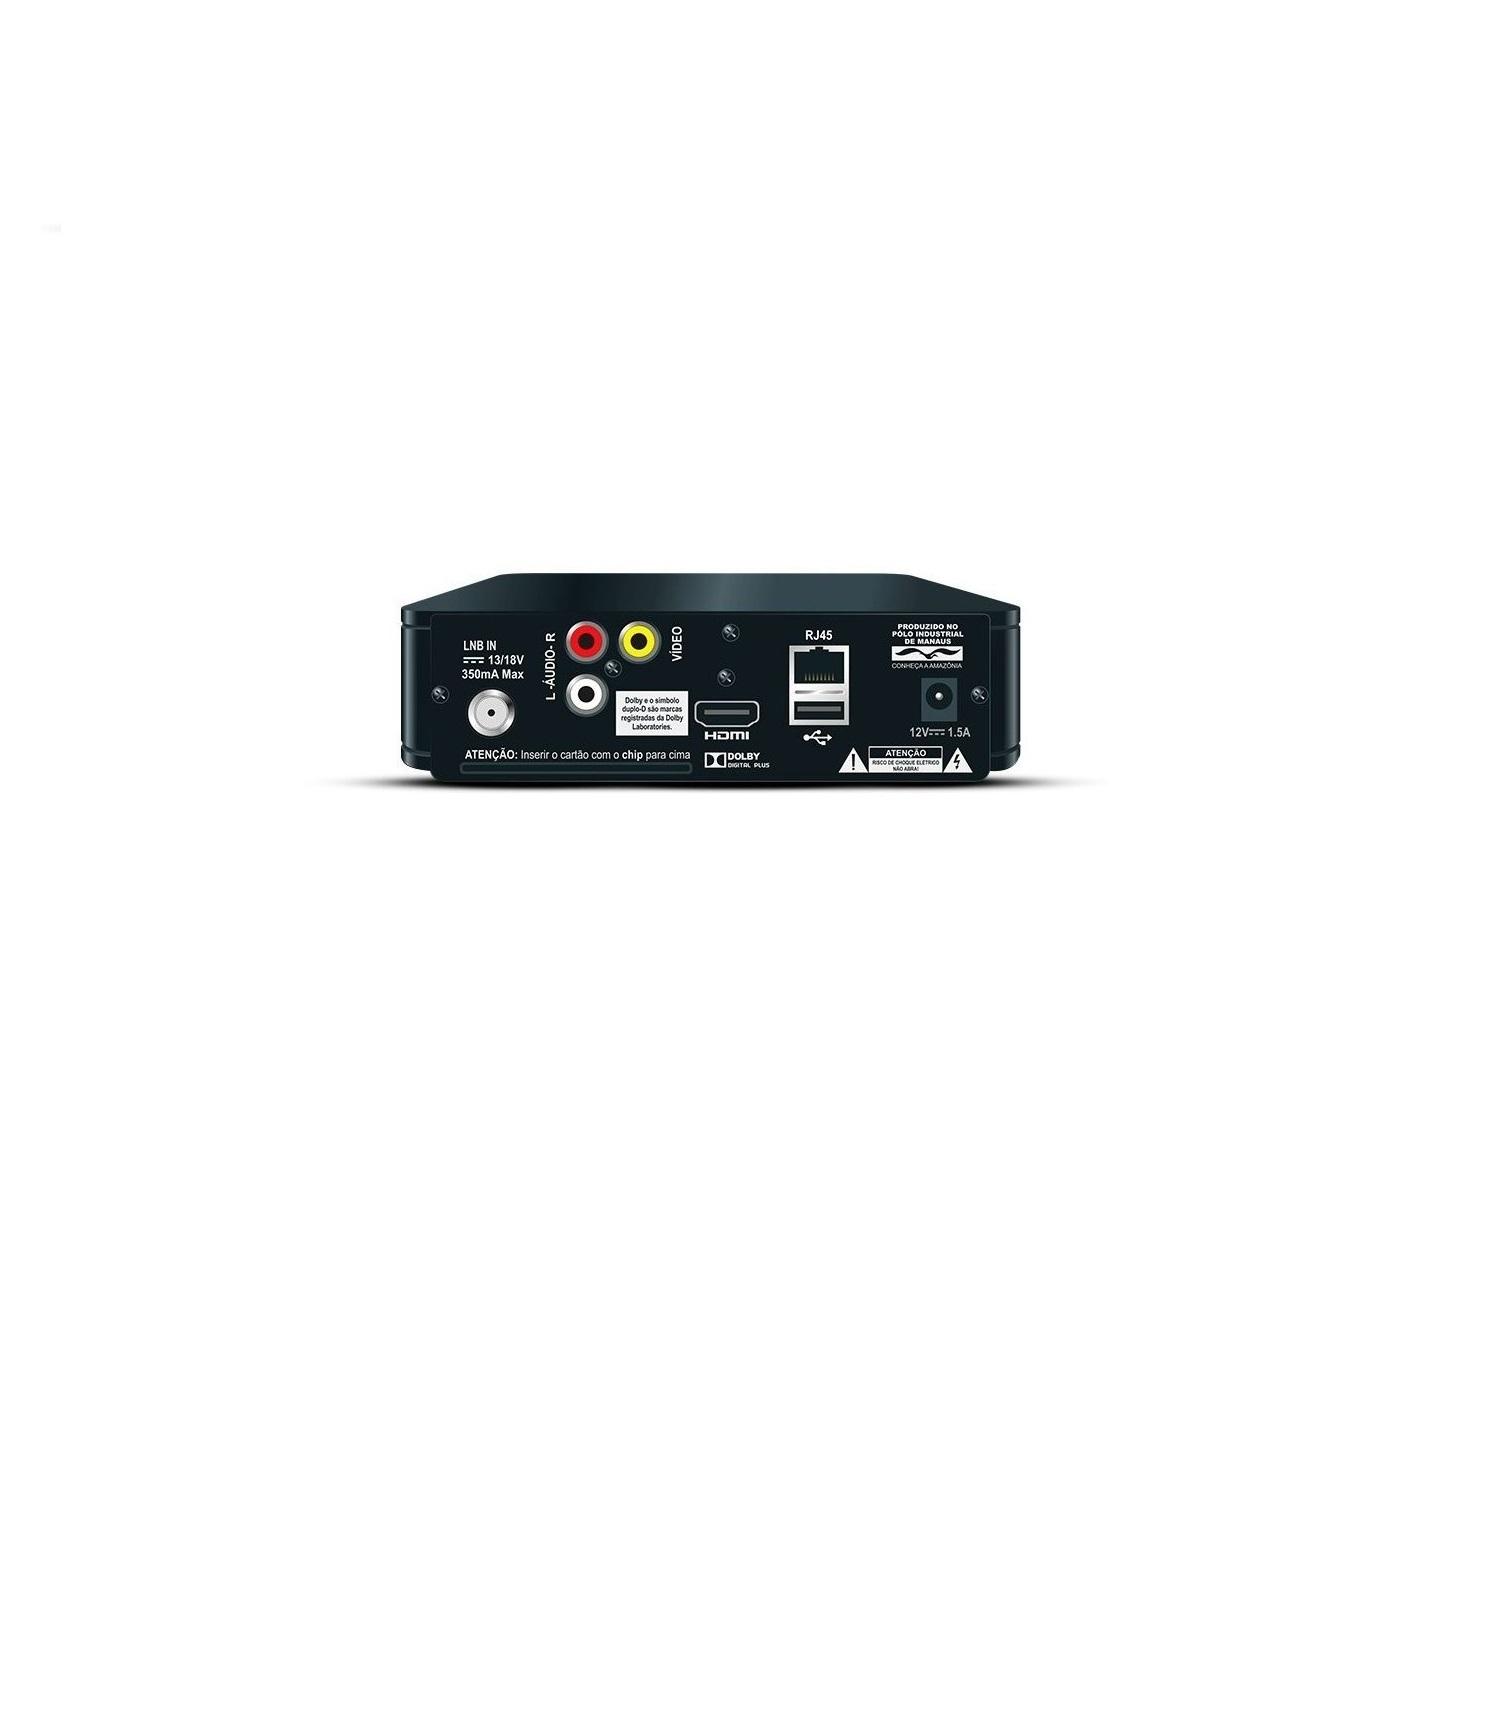 CONVERSOR OI TV RECON - MULTILASER GS0604 - NOVO RECONDICION